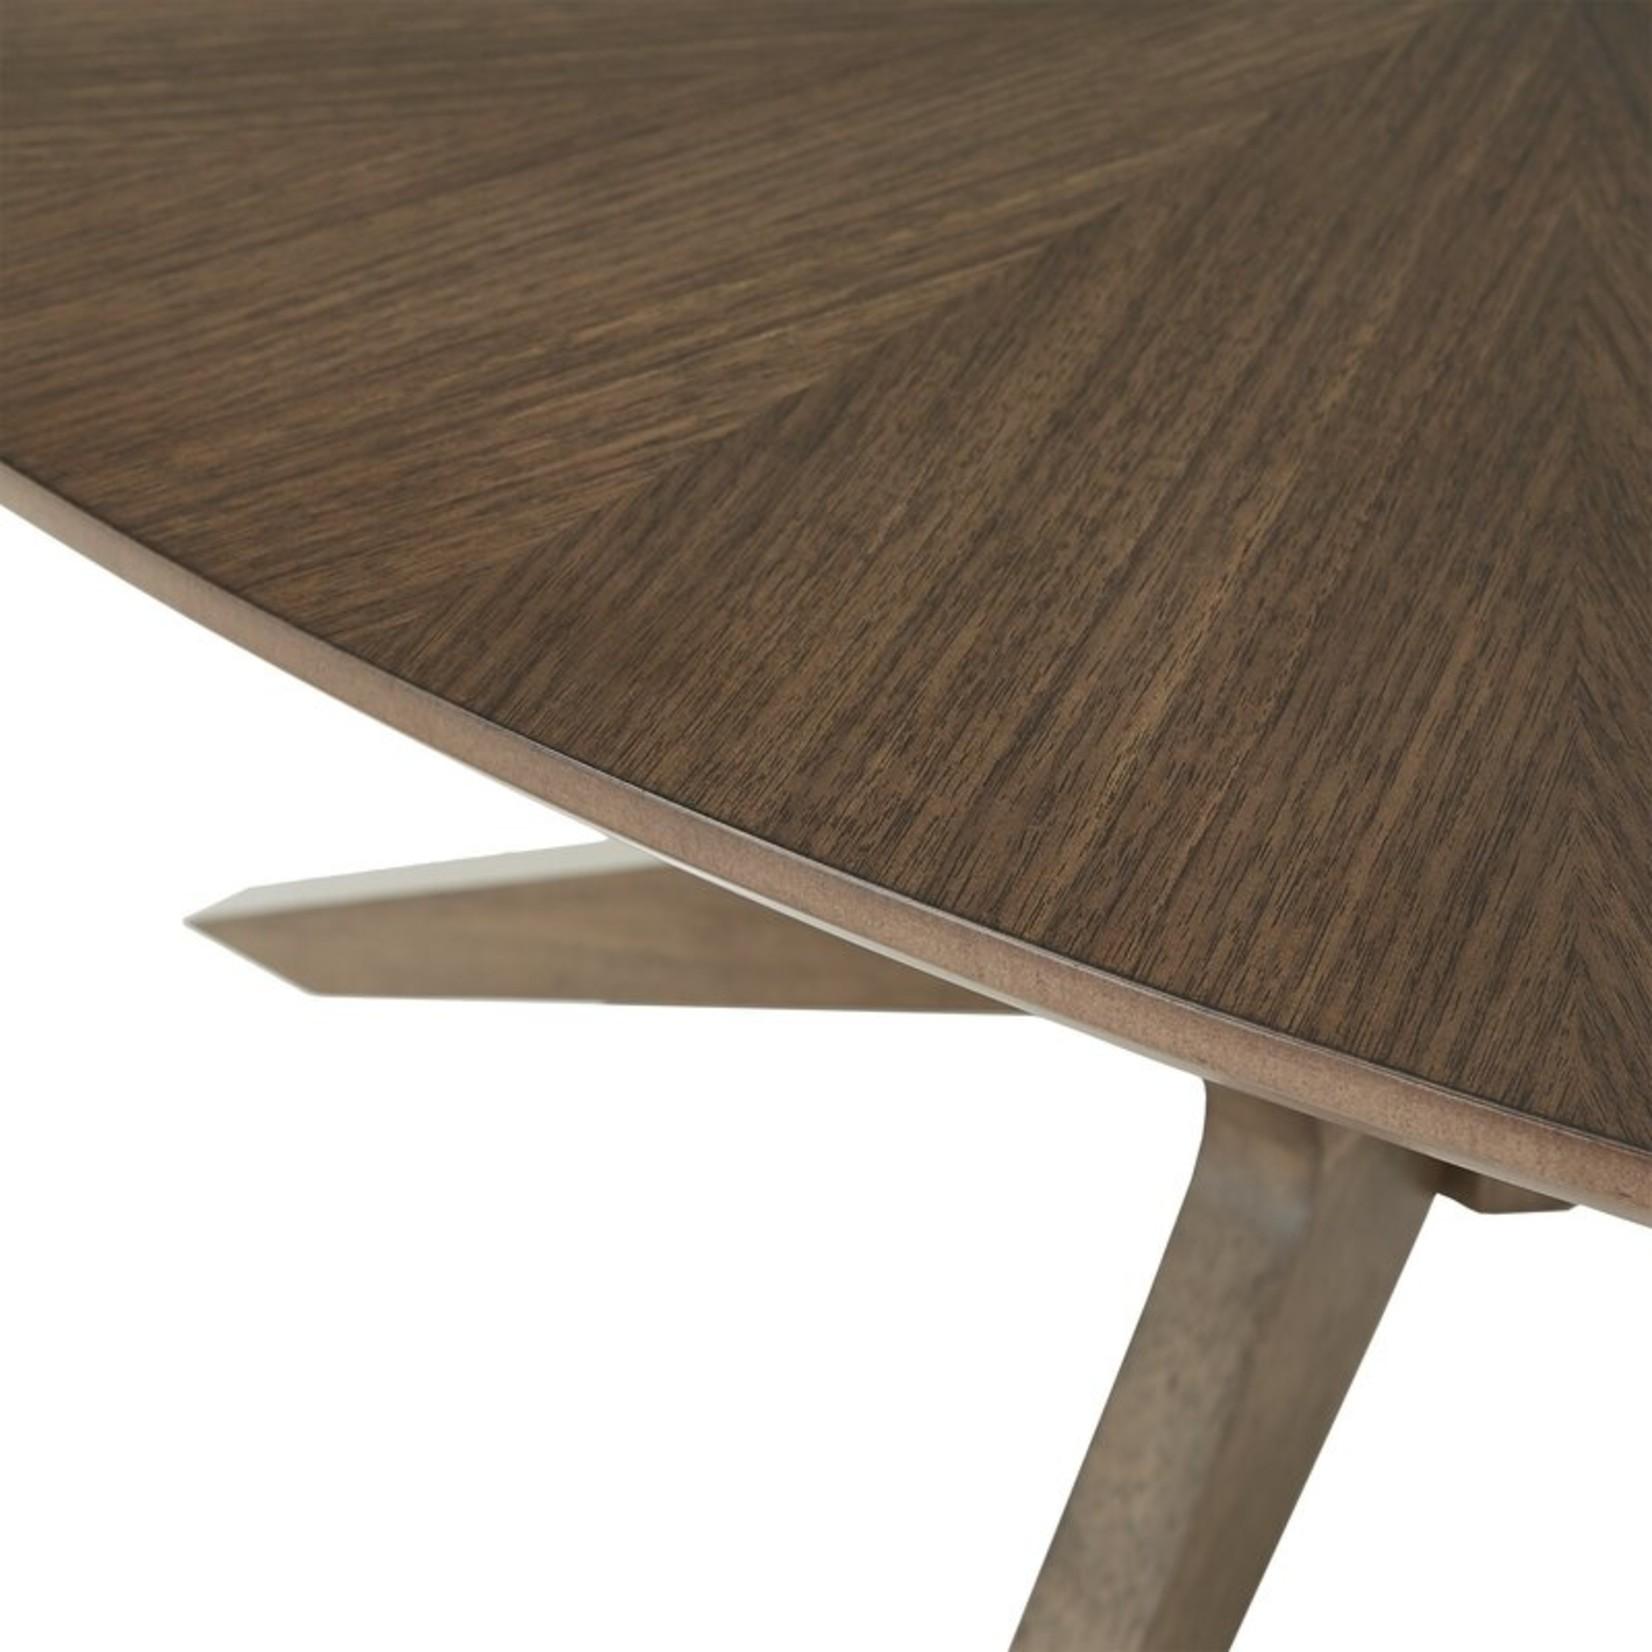 *Pedestal Coffee Table - Slight Damage